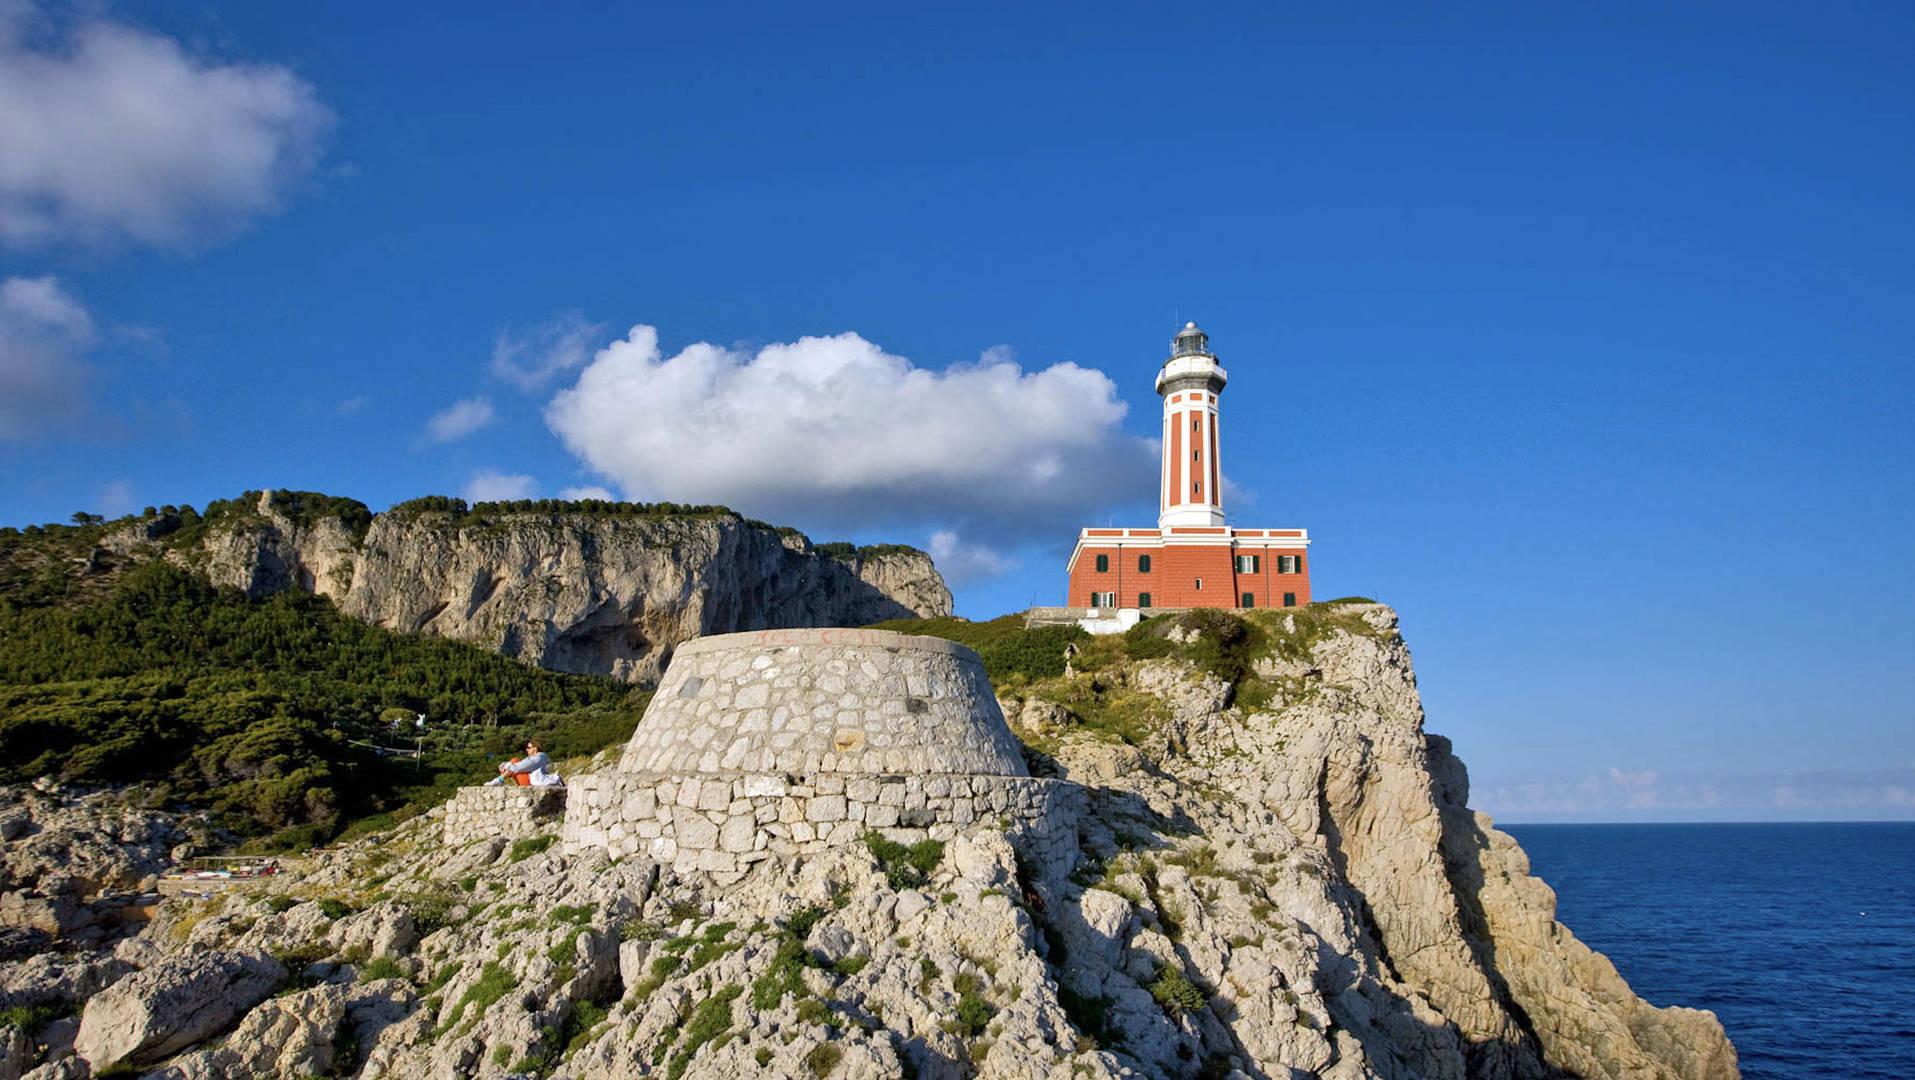 Lighthouse on Capri